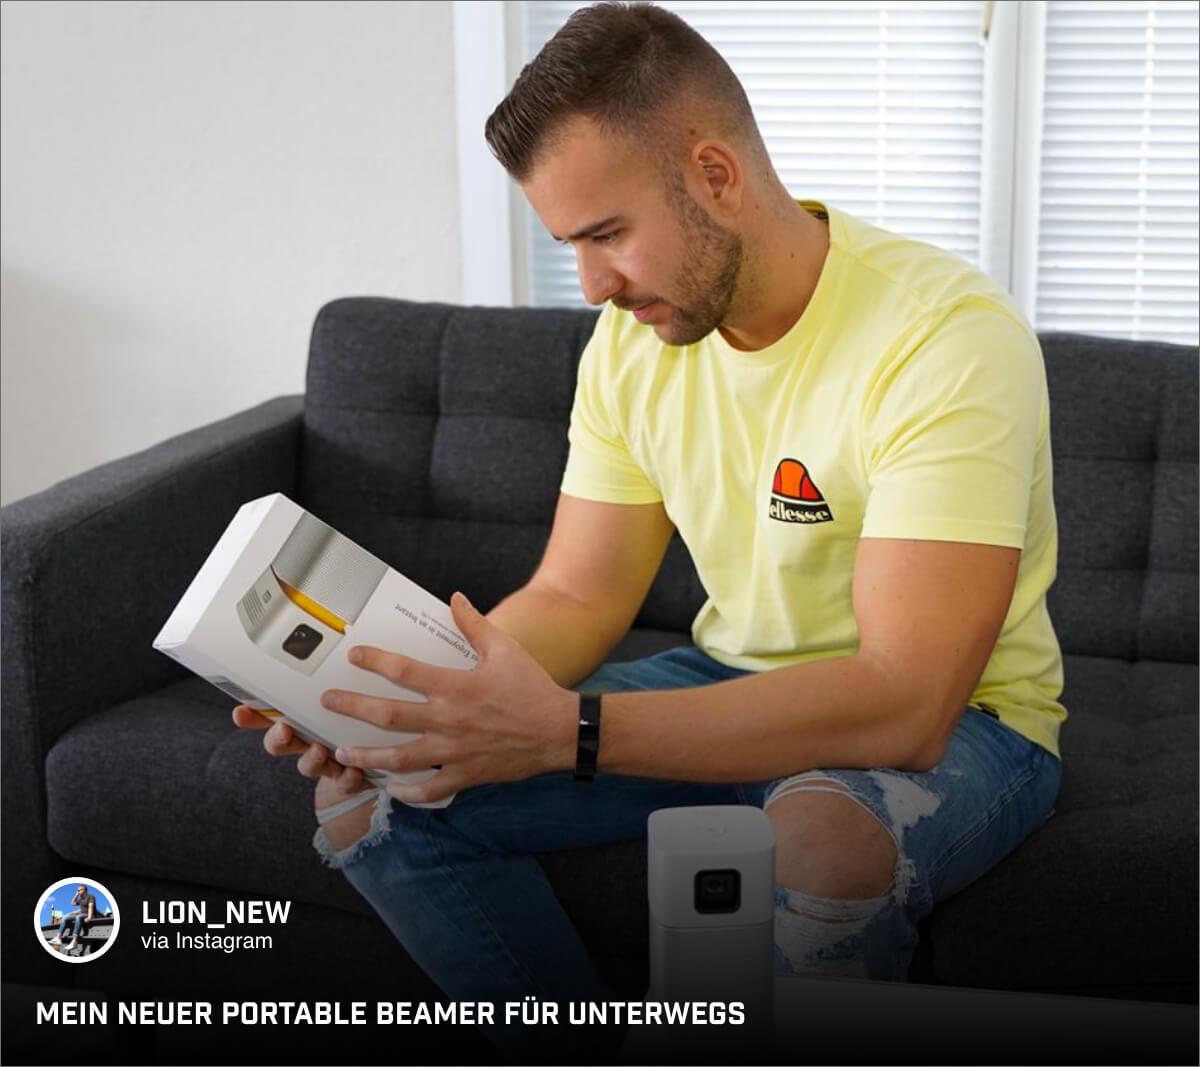 Lifestyle-Blogger @lion_new sieht sich die Features des portablen Mini-Beamers GV1 an.